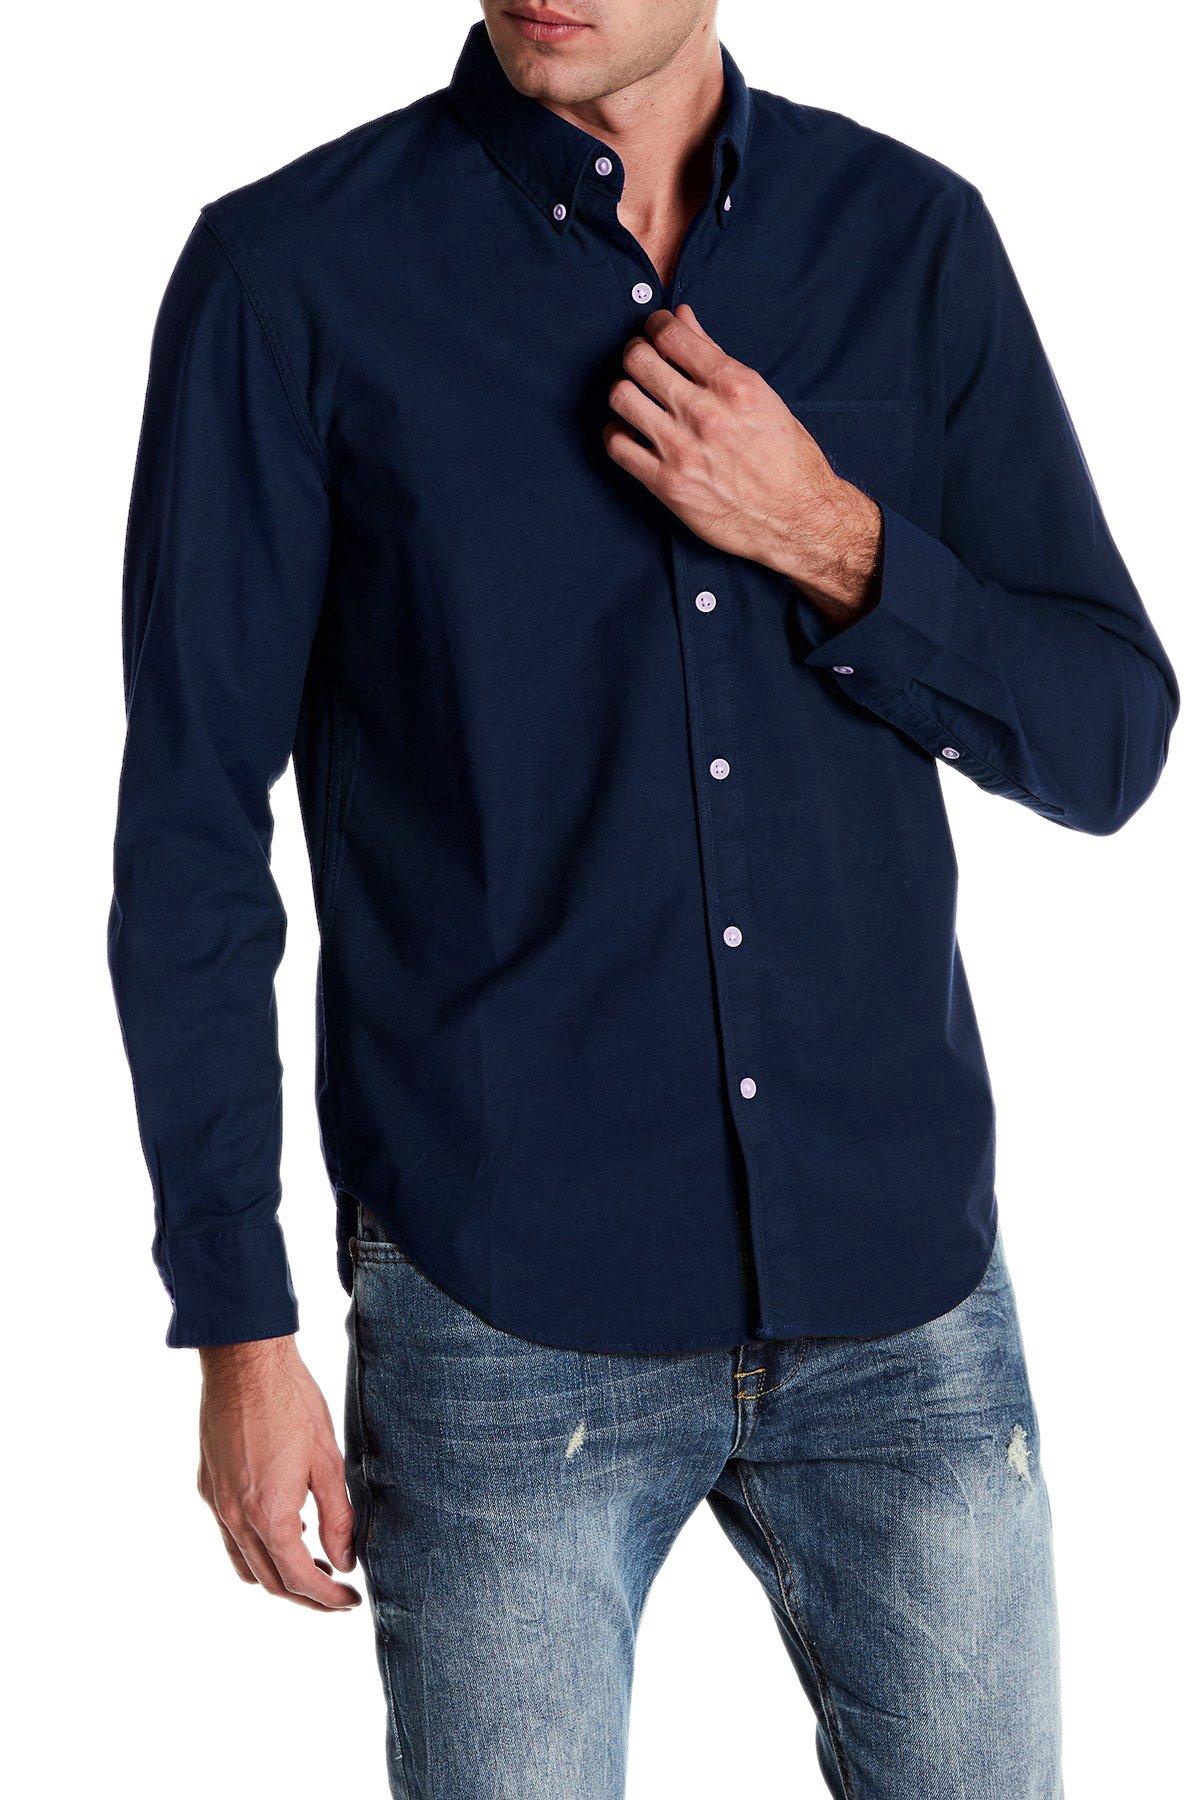 Lucky Brand Saturday Stretch Military Oxford Shirt (Medium)